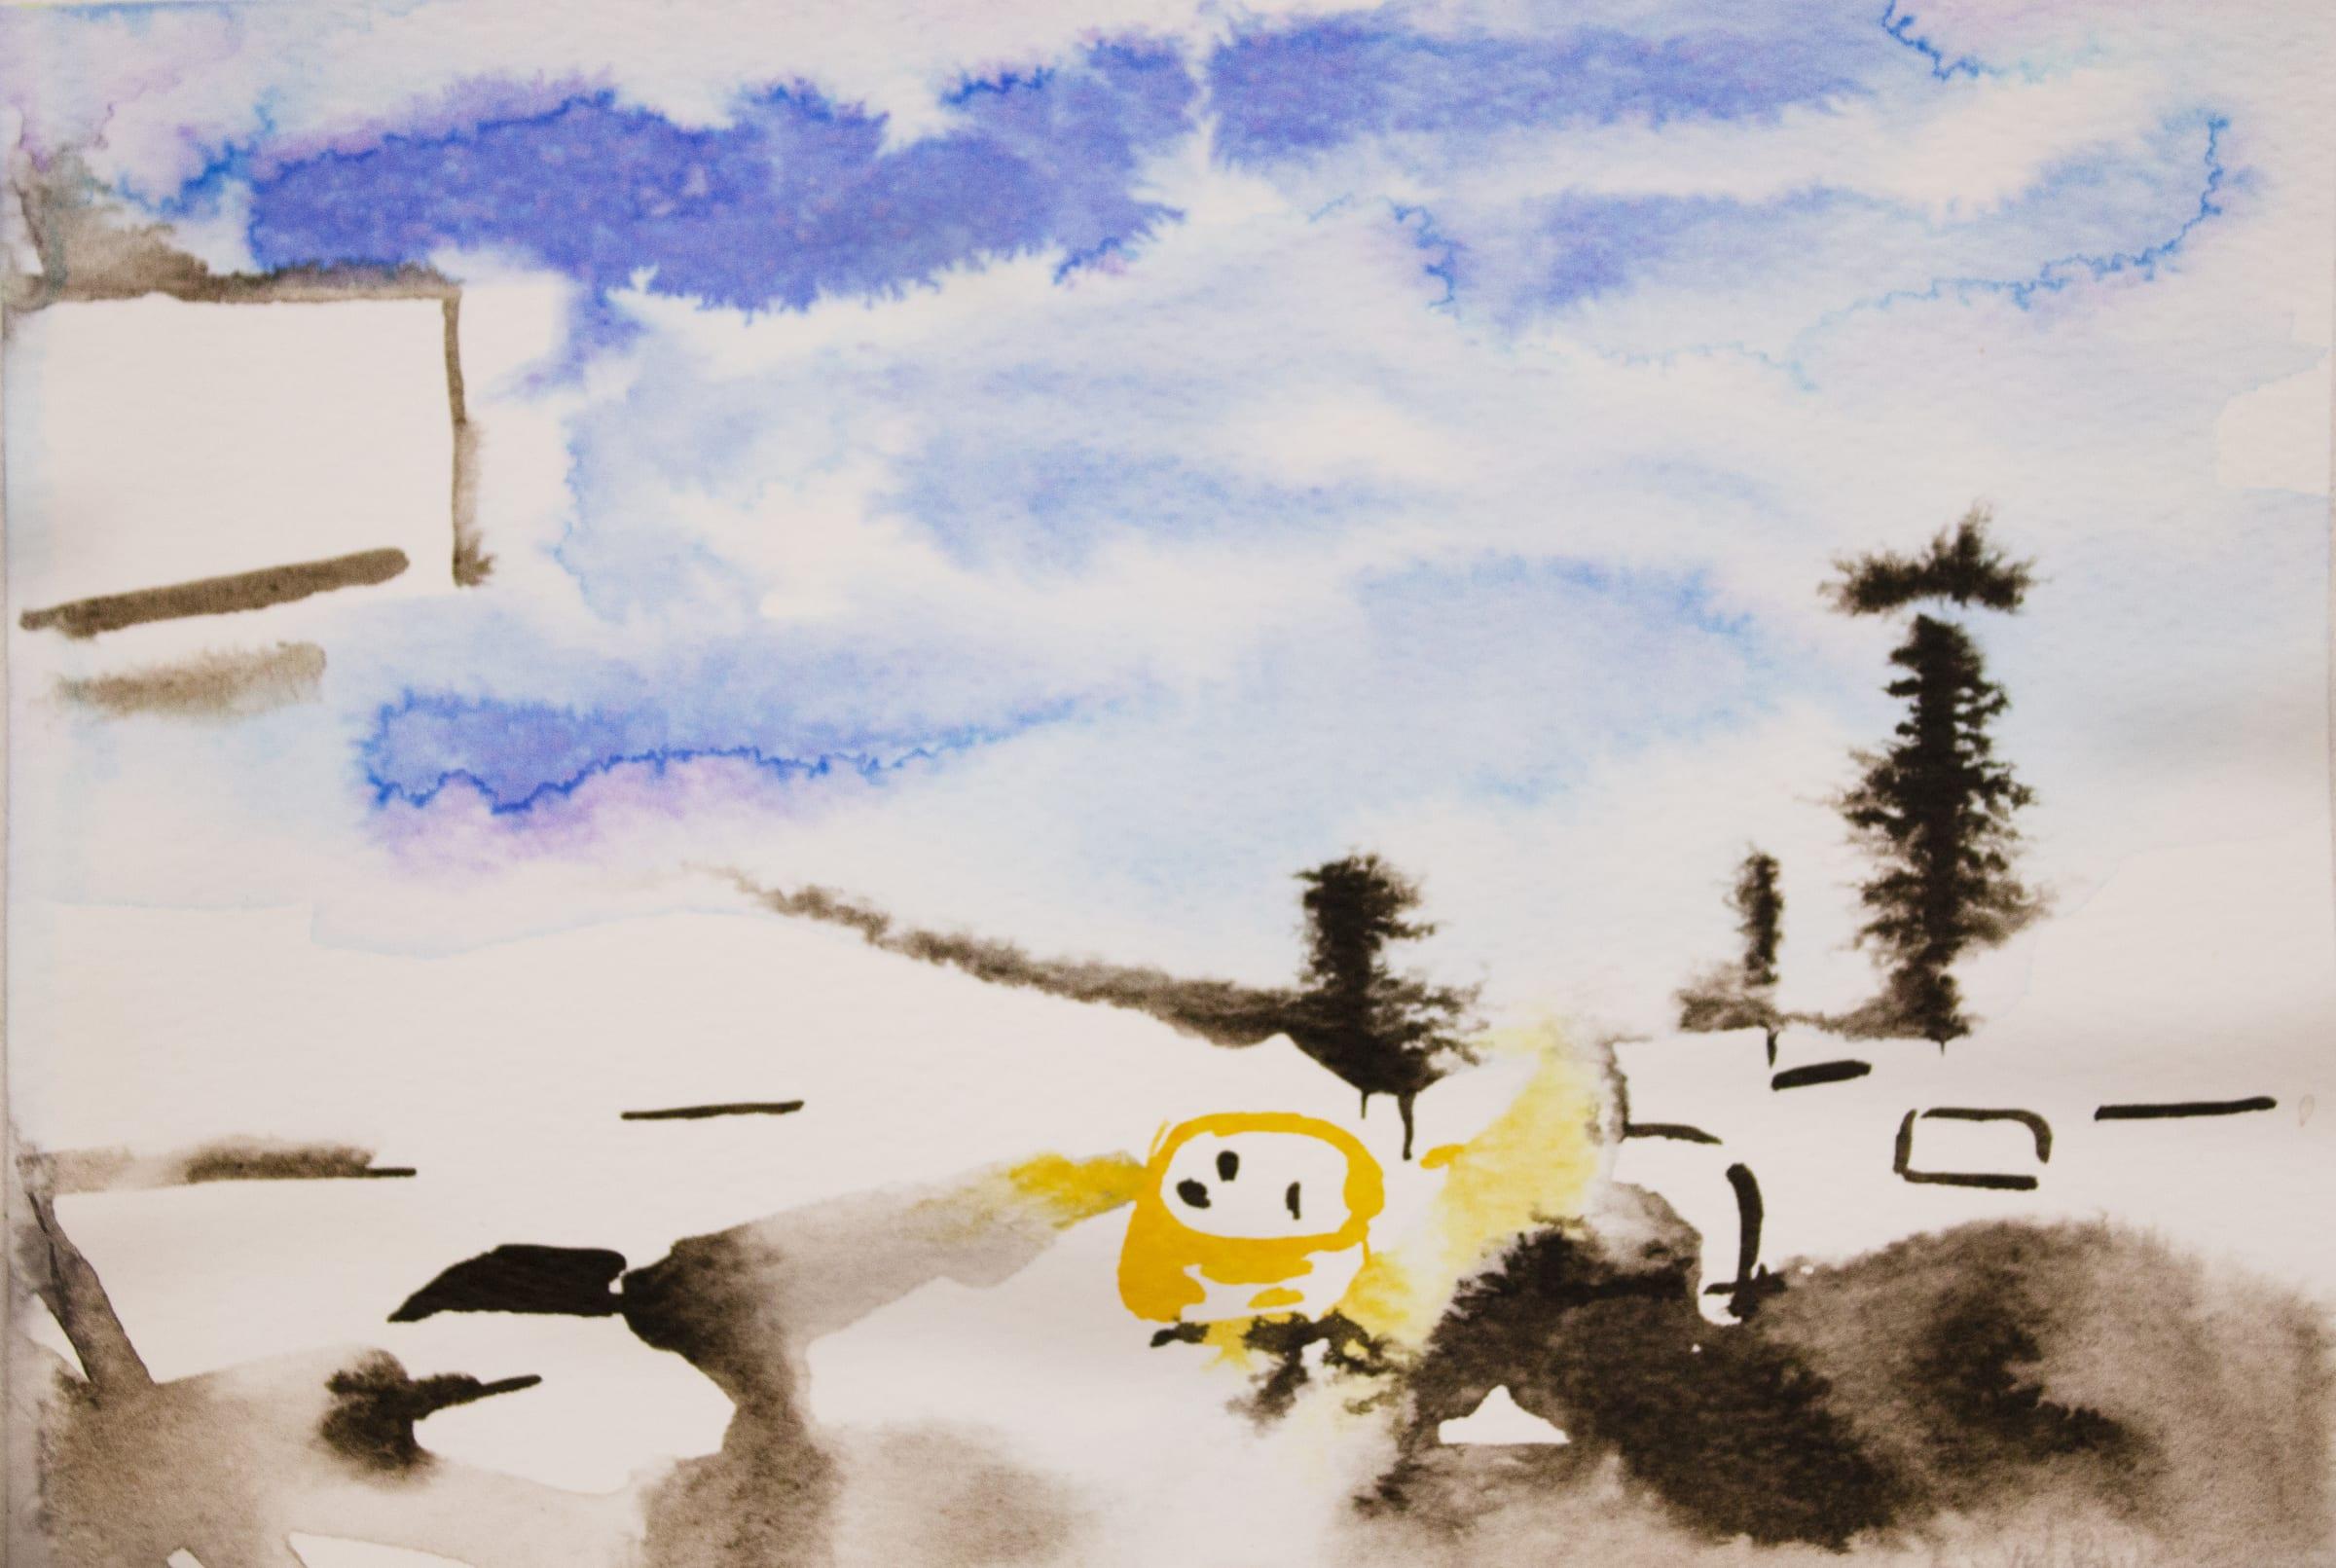 <span class=&#34;link fancybox-details-link&#34;><a href=&#34;/artists/88-louise-van-der-bijl/works/2275-louise-van-der-bijl-inktober-day-13-2018/&#34;>View Detail Page</a></span><div class=&#34;artist&#34;><strong>Louise Van Der Bijl</strong></div> <div class=&#34;title&#34;><em>Inktober Day 13</em>, 2018</div> <div class=&#34;medium&#34;>Ink On Paper</div> <div class=&#34;dimensions&#34;>14.7cm x 20.9cm</div><div class=&#34;price&#34;>R400.00</div>